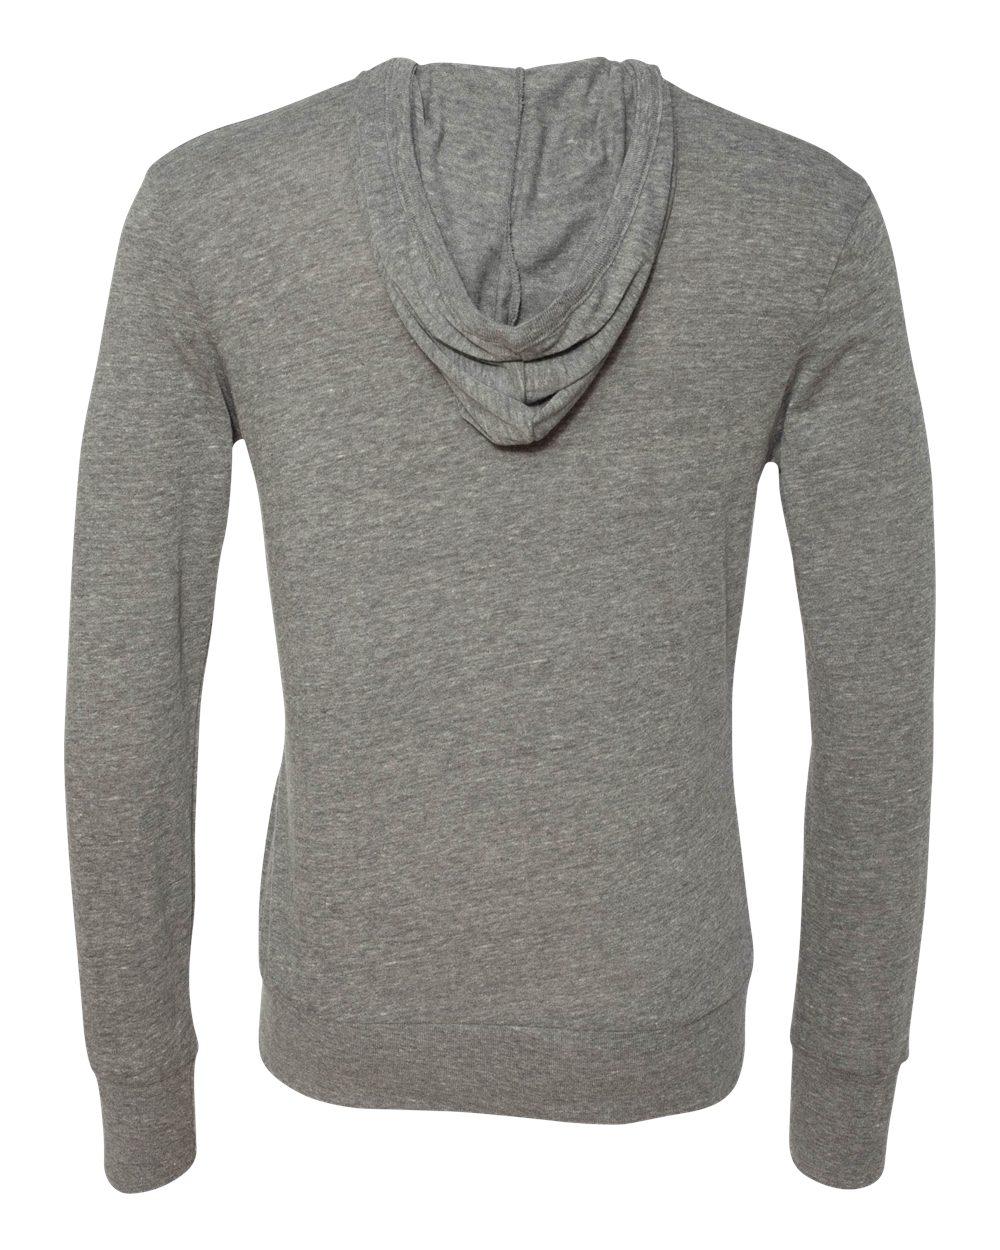 Alternative-Mens-Eco-Jersey-Hooded-Full-Zip-T-Shirt-Blank-Plain-1970e1-up-to-3XL miniature 10